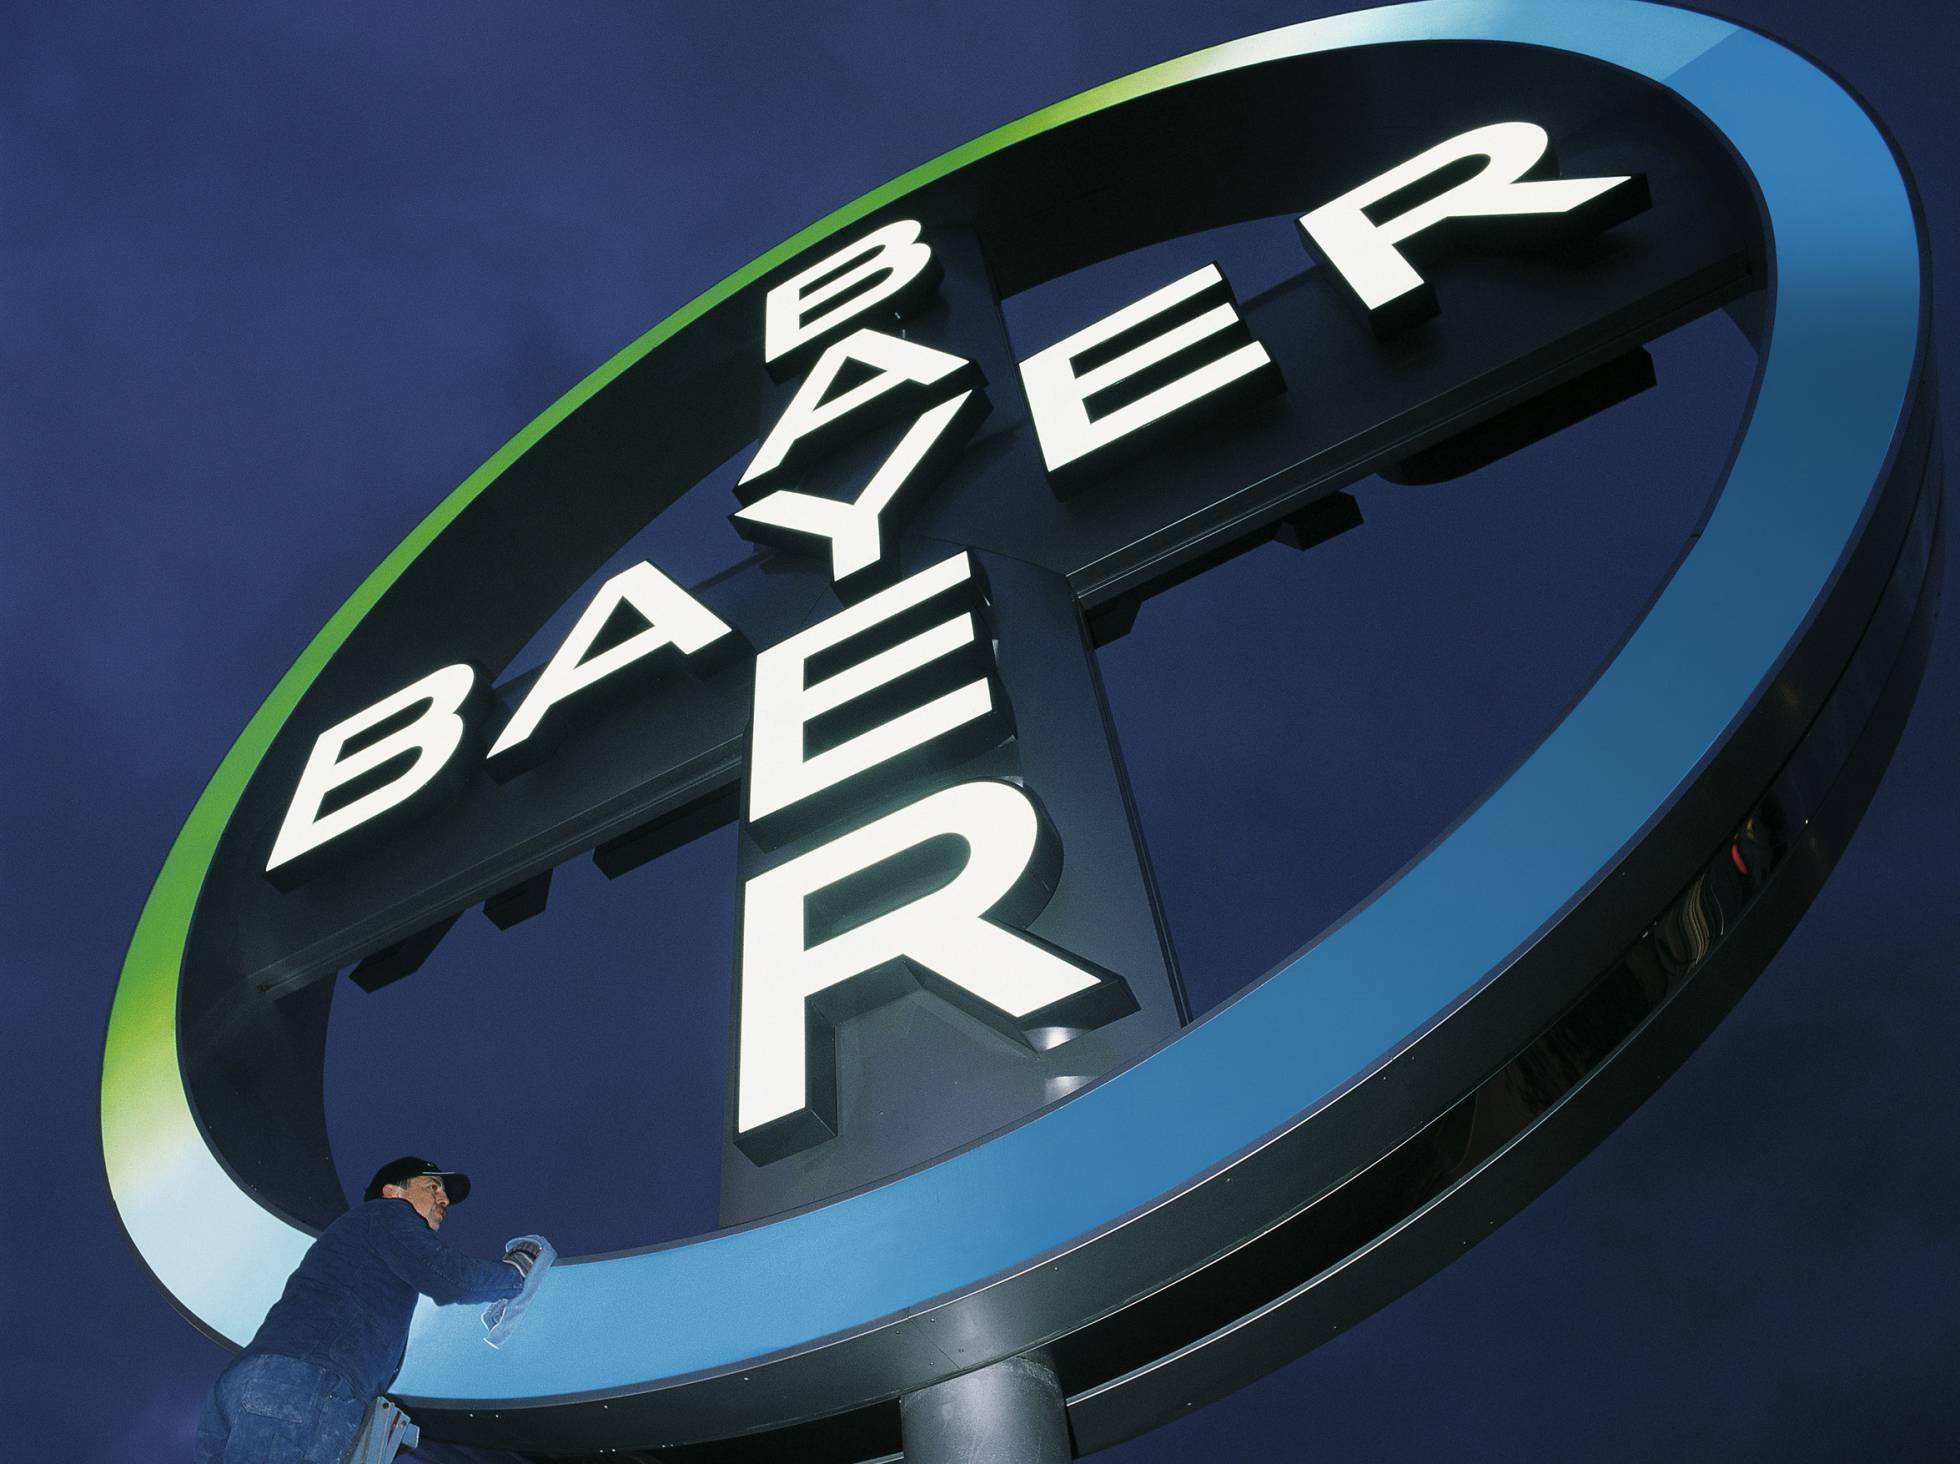 borda laboratorios. Bayer